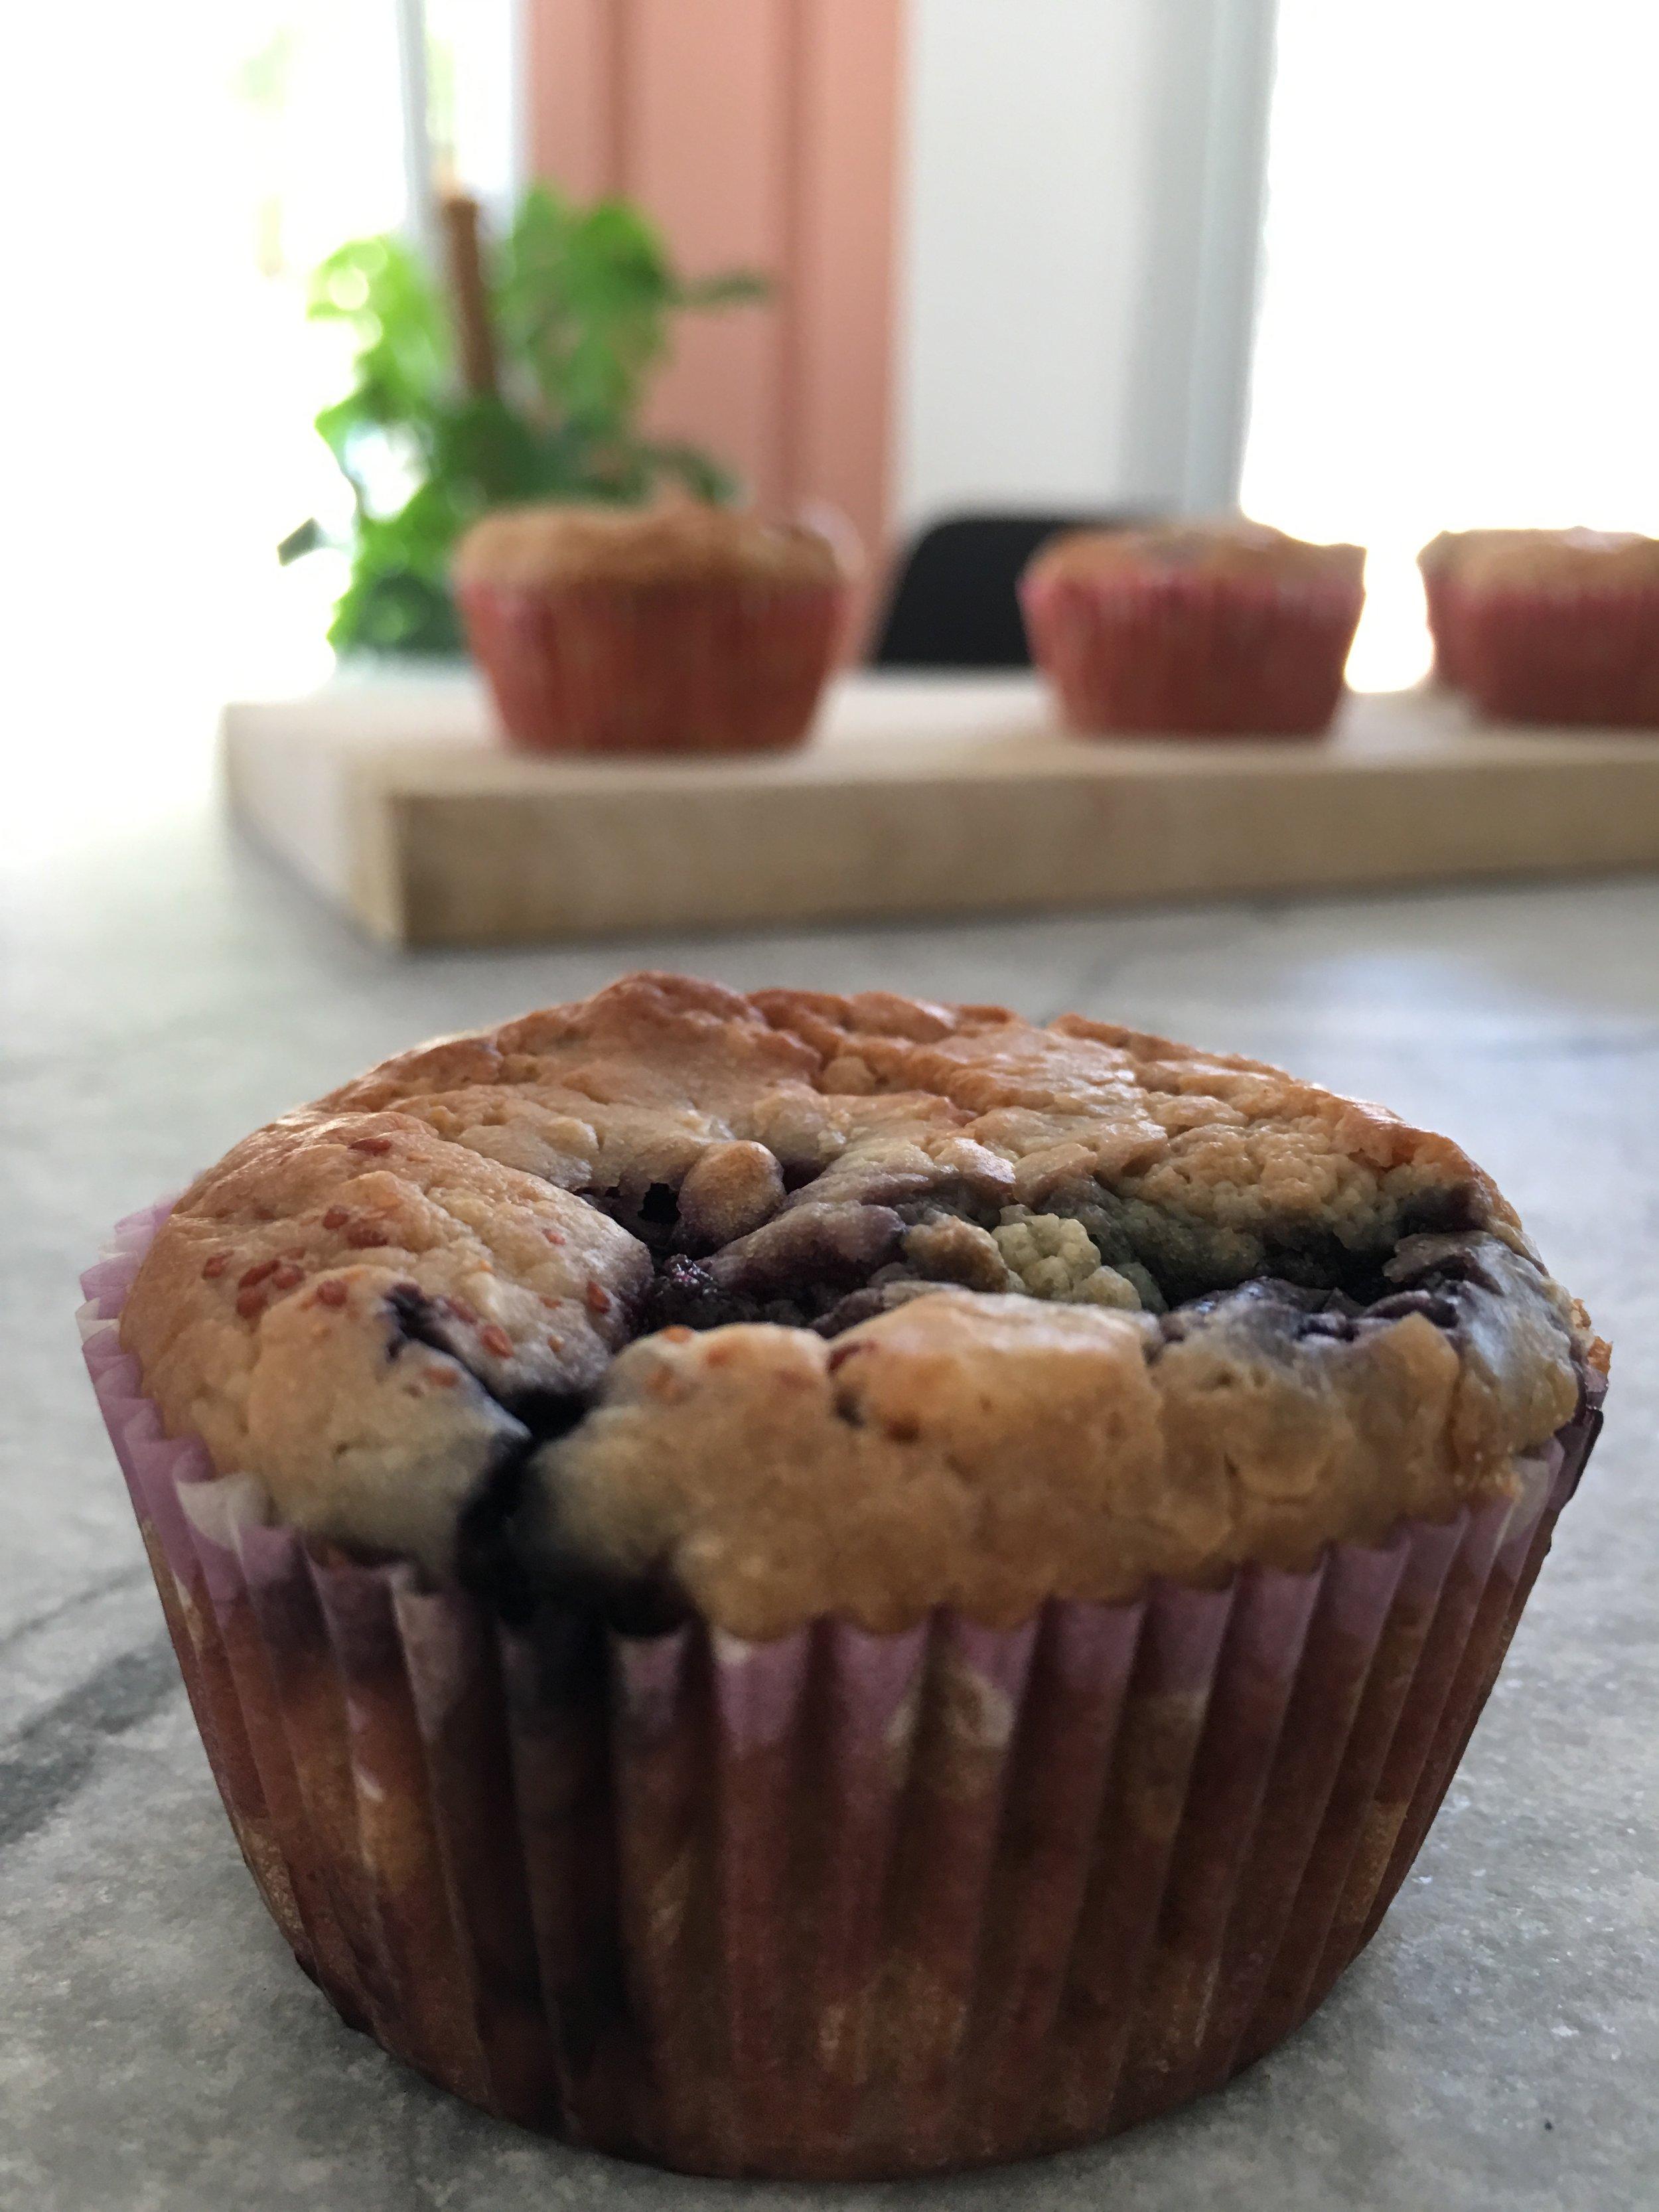 Vegan blueberry muffins recipe - Rebecca Kourmouzi Registered clinical dietitian/nutritionist based in Nicosia Cyprus